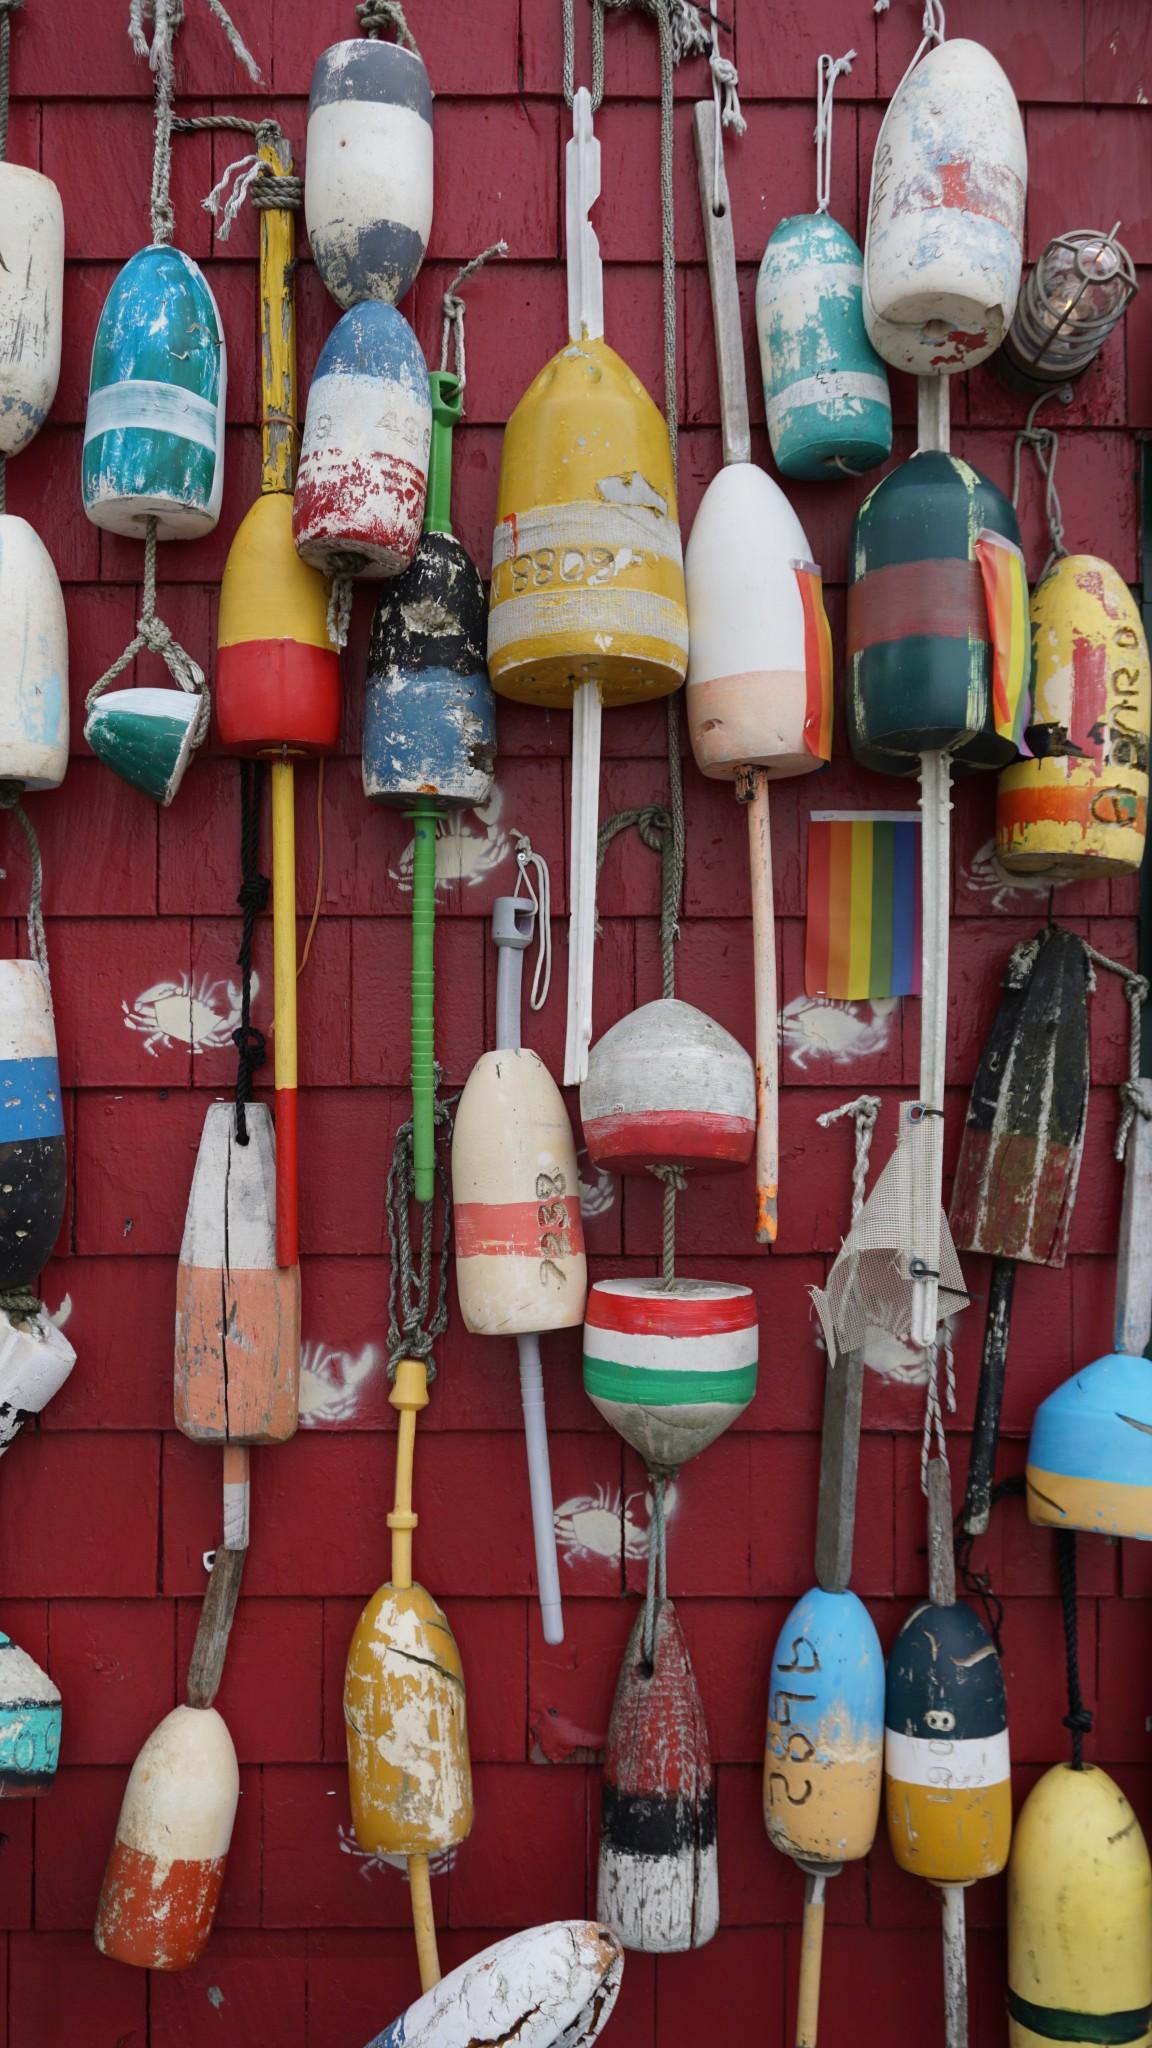 buoys boston, the-alyst.com